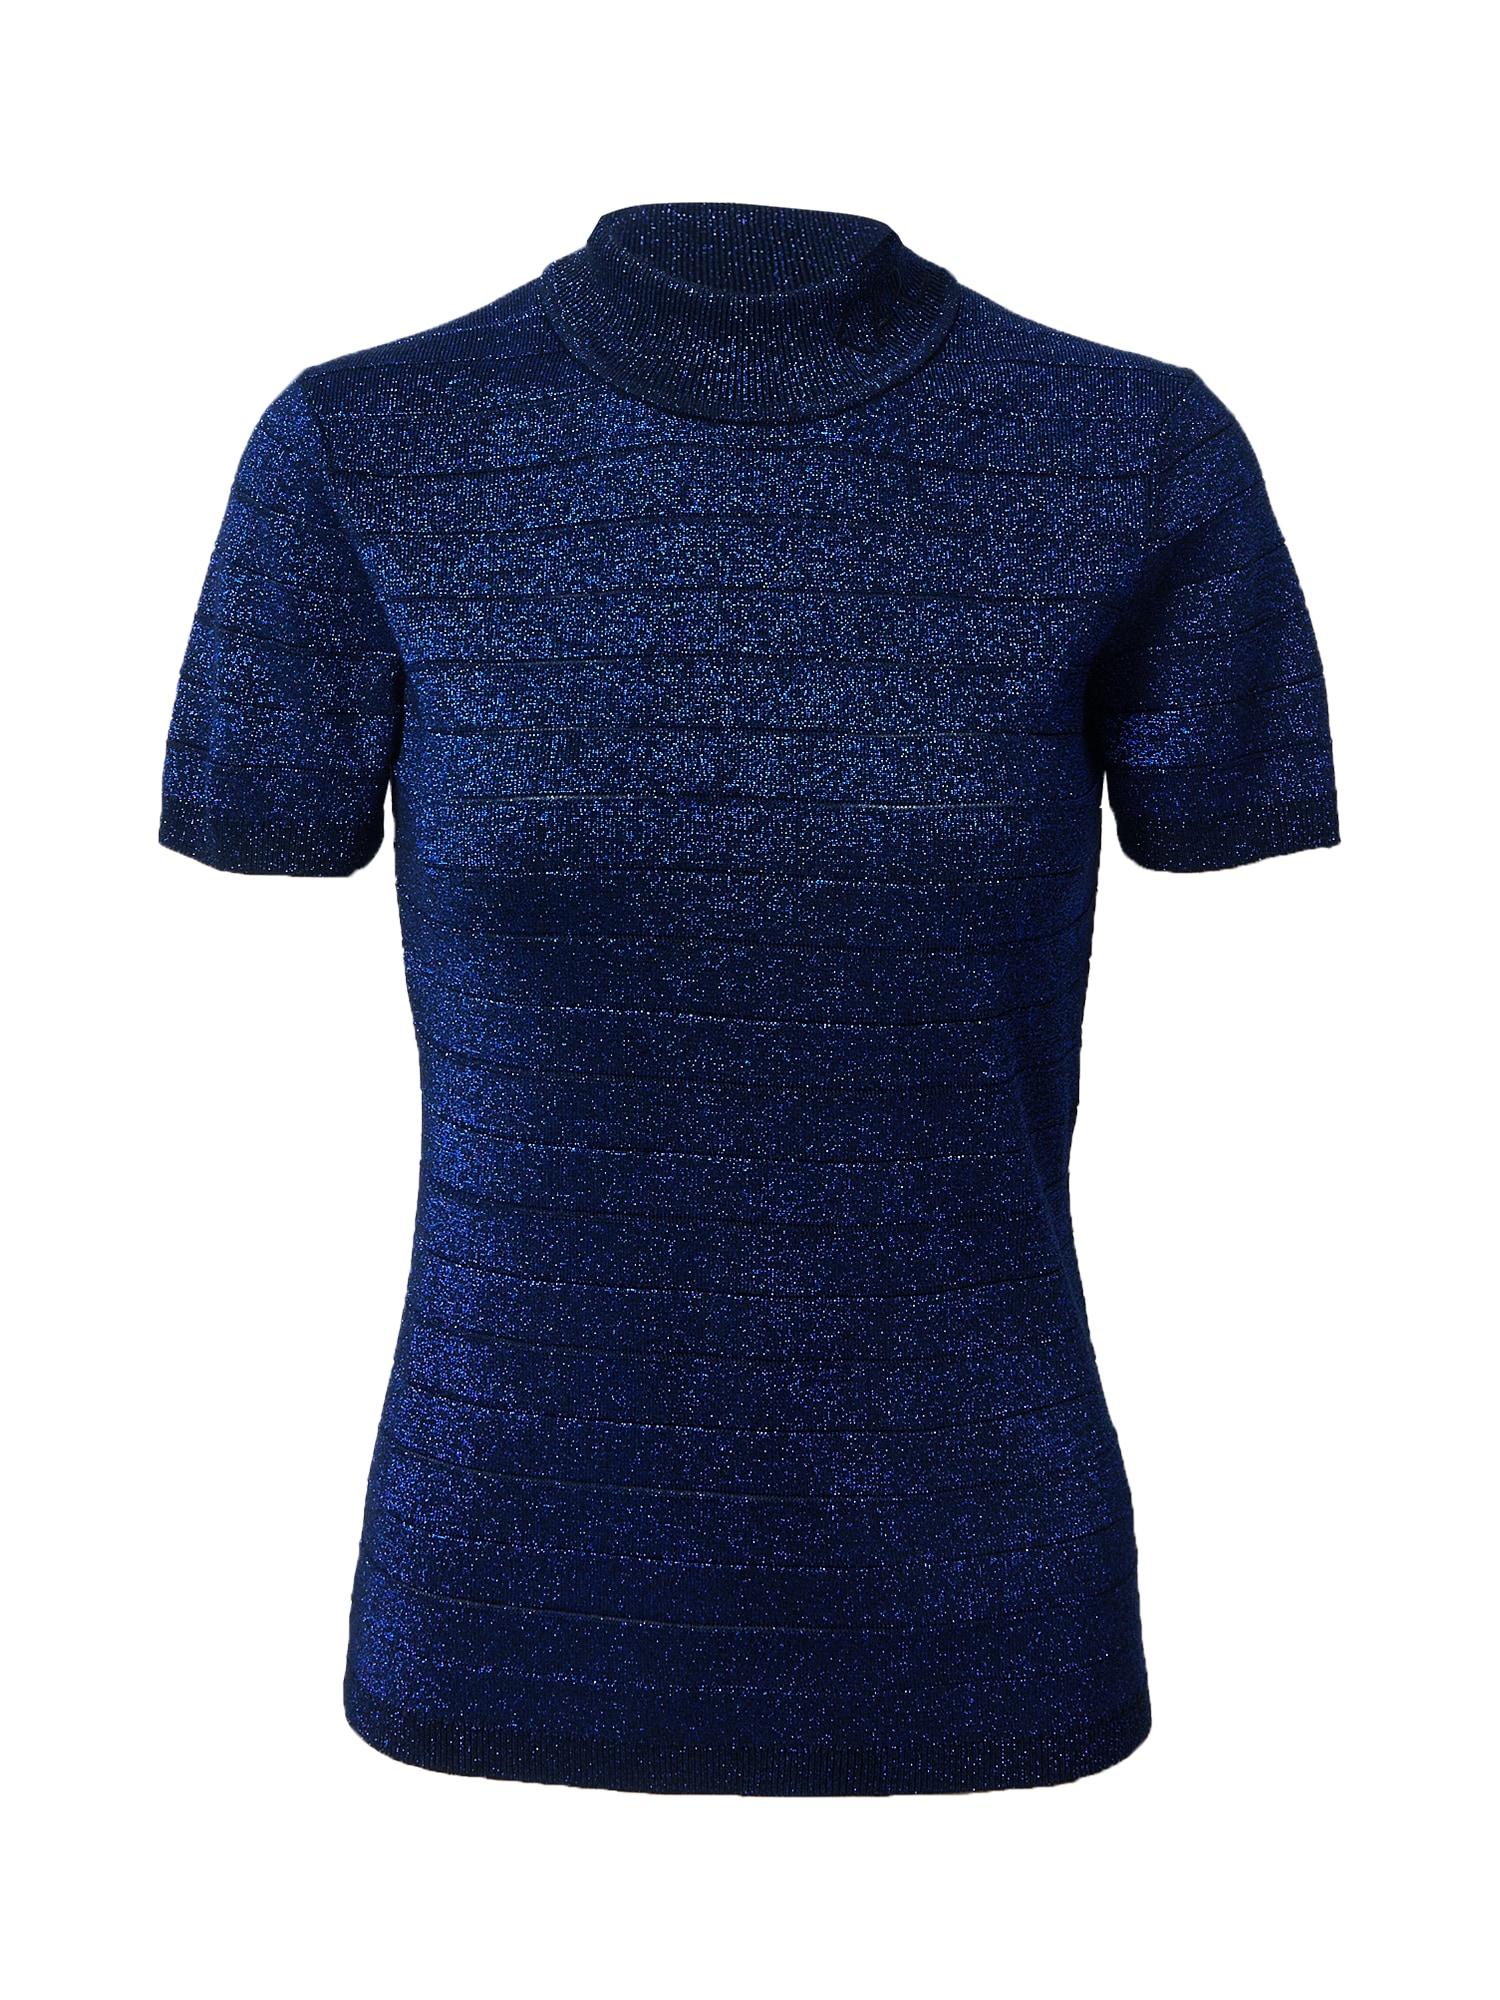 Karl Lagerfeld Marškinėliai mėlyna